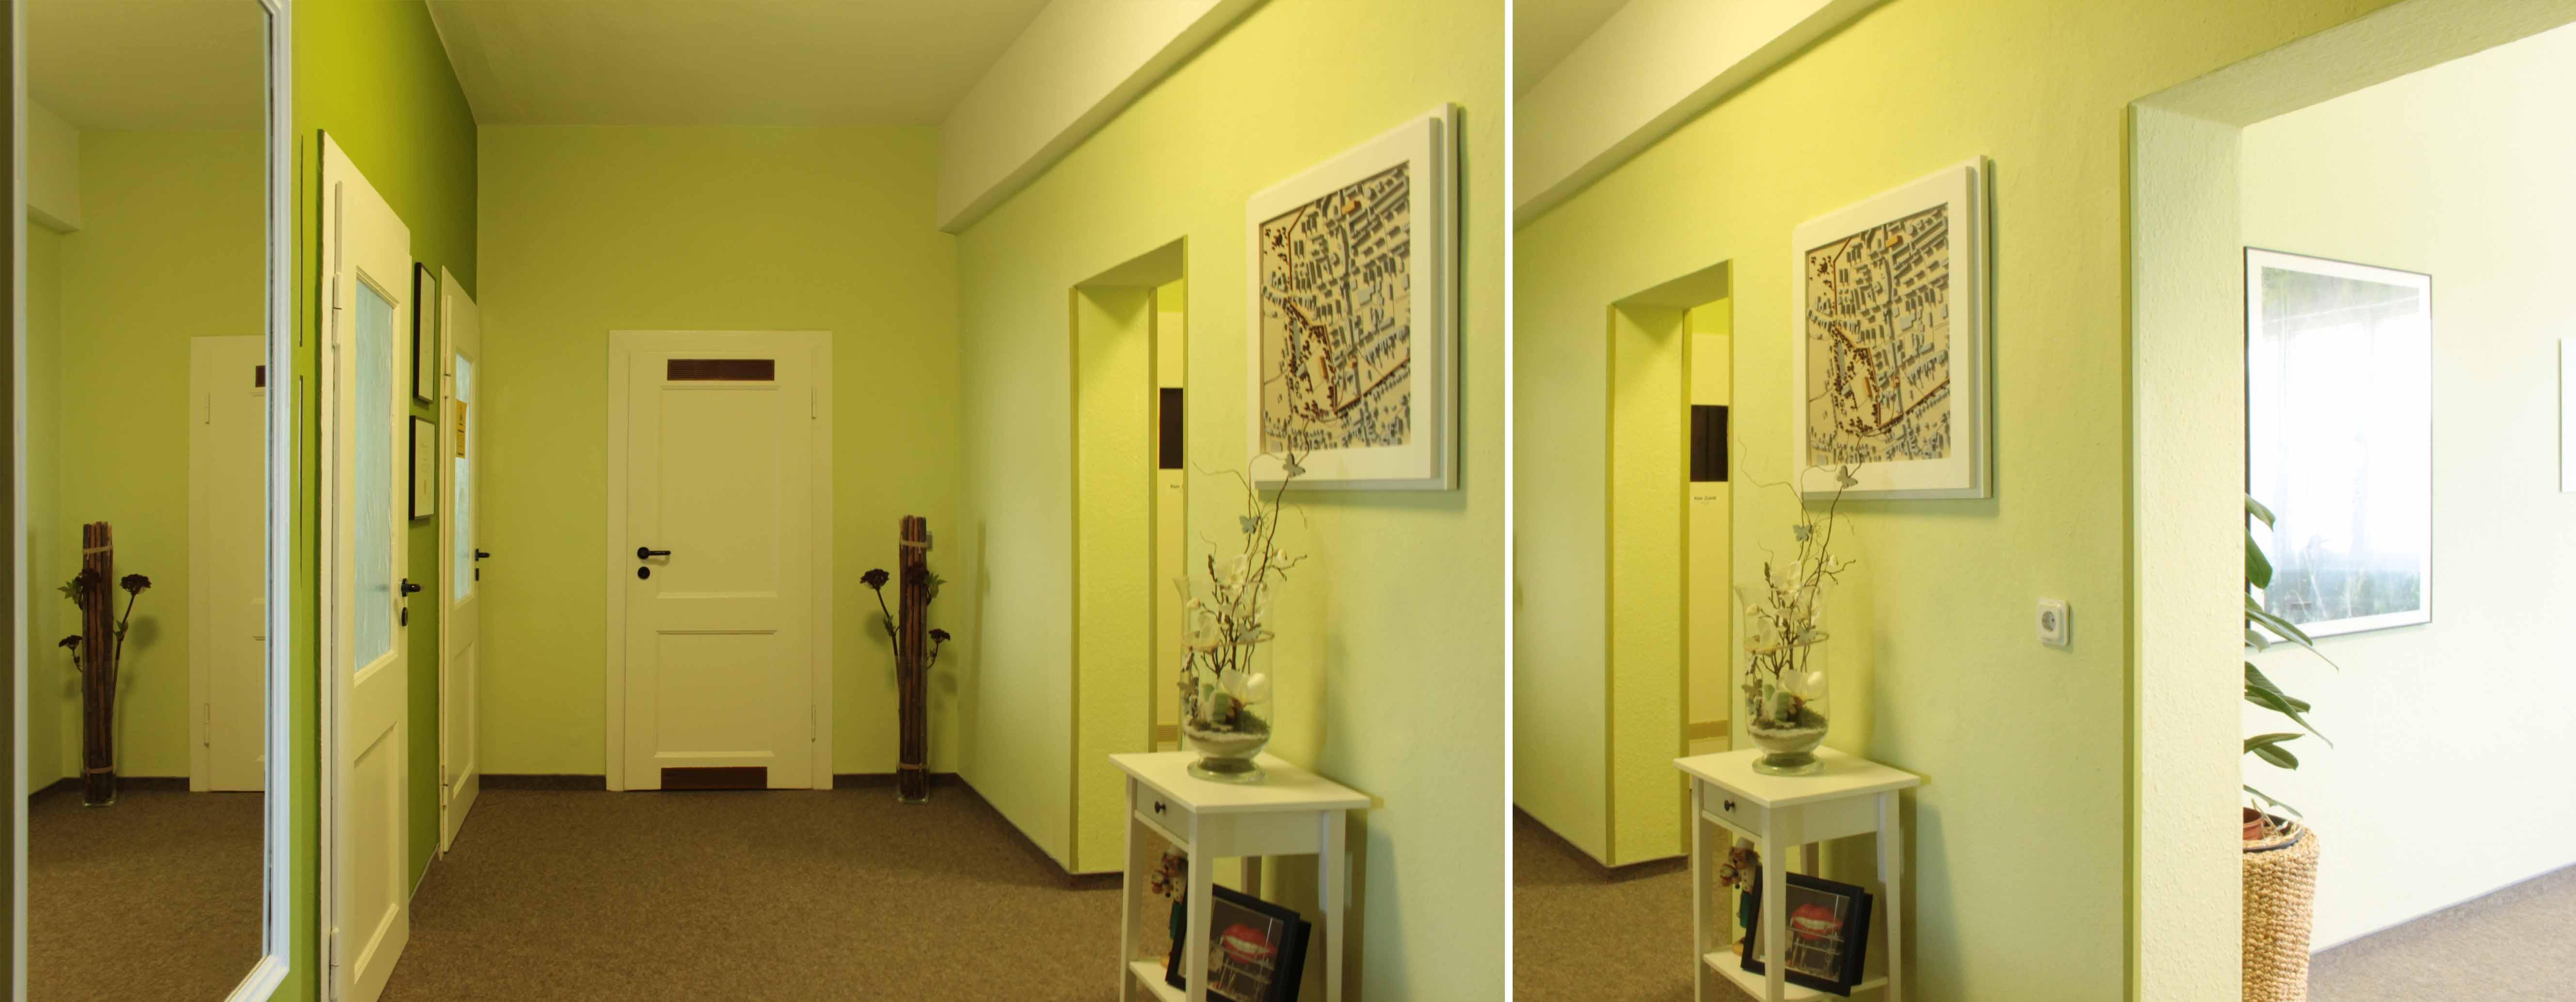 Eingangsbereich der Praxis - Zahnarztpraxis im Zerbster Zentrum - Zahnarzt Dr. med. Bernd Lux